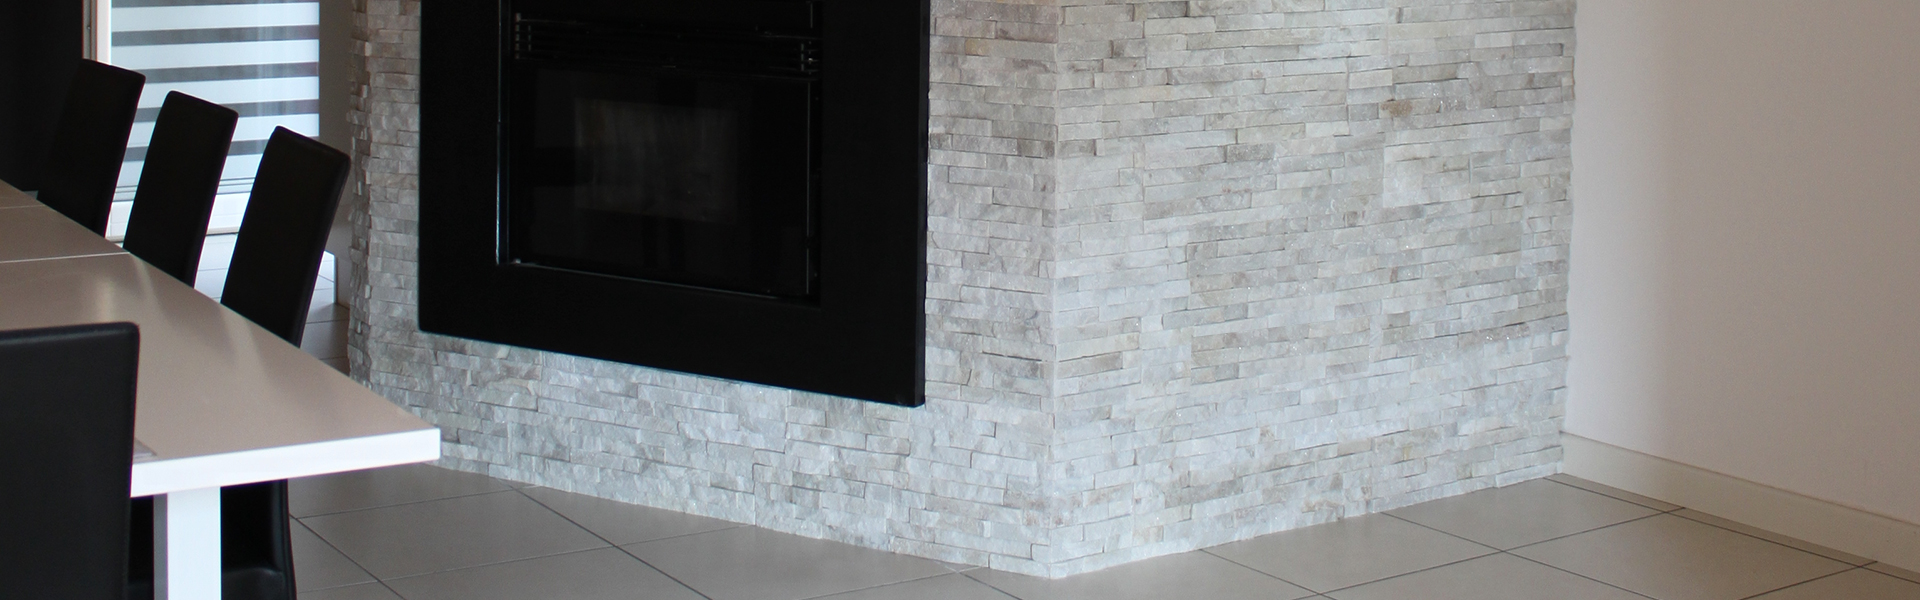 Pietra naturale - Edil Decor Casa